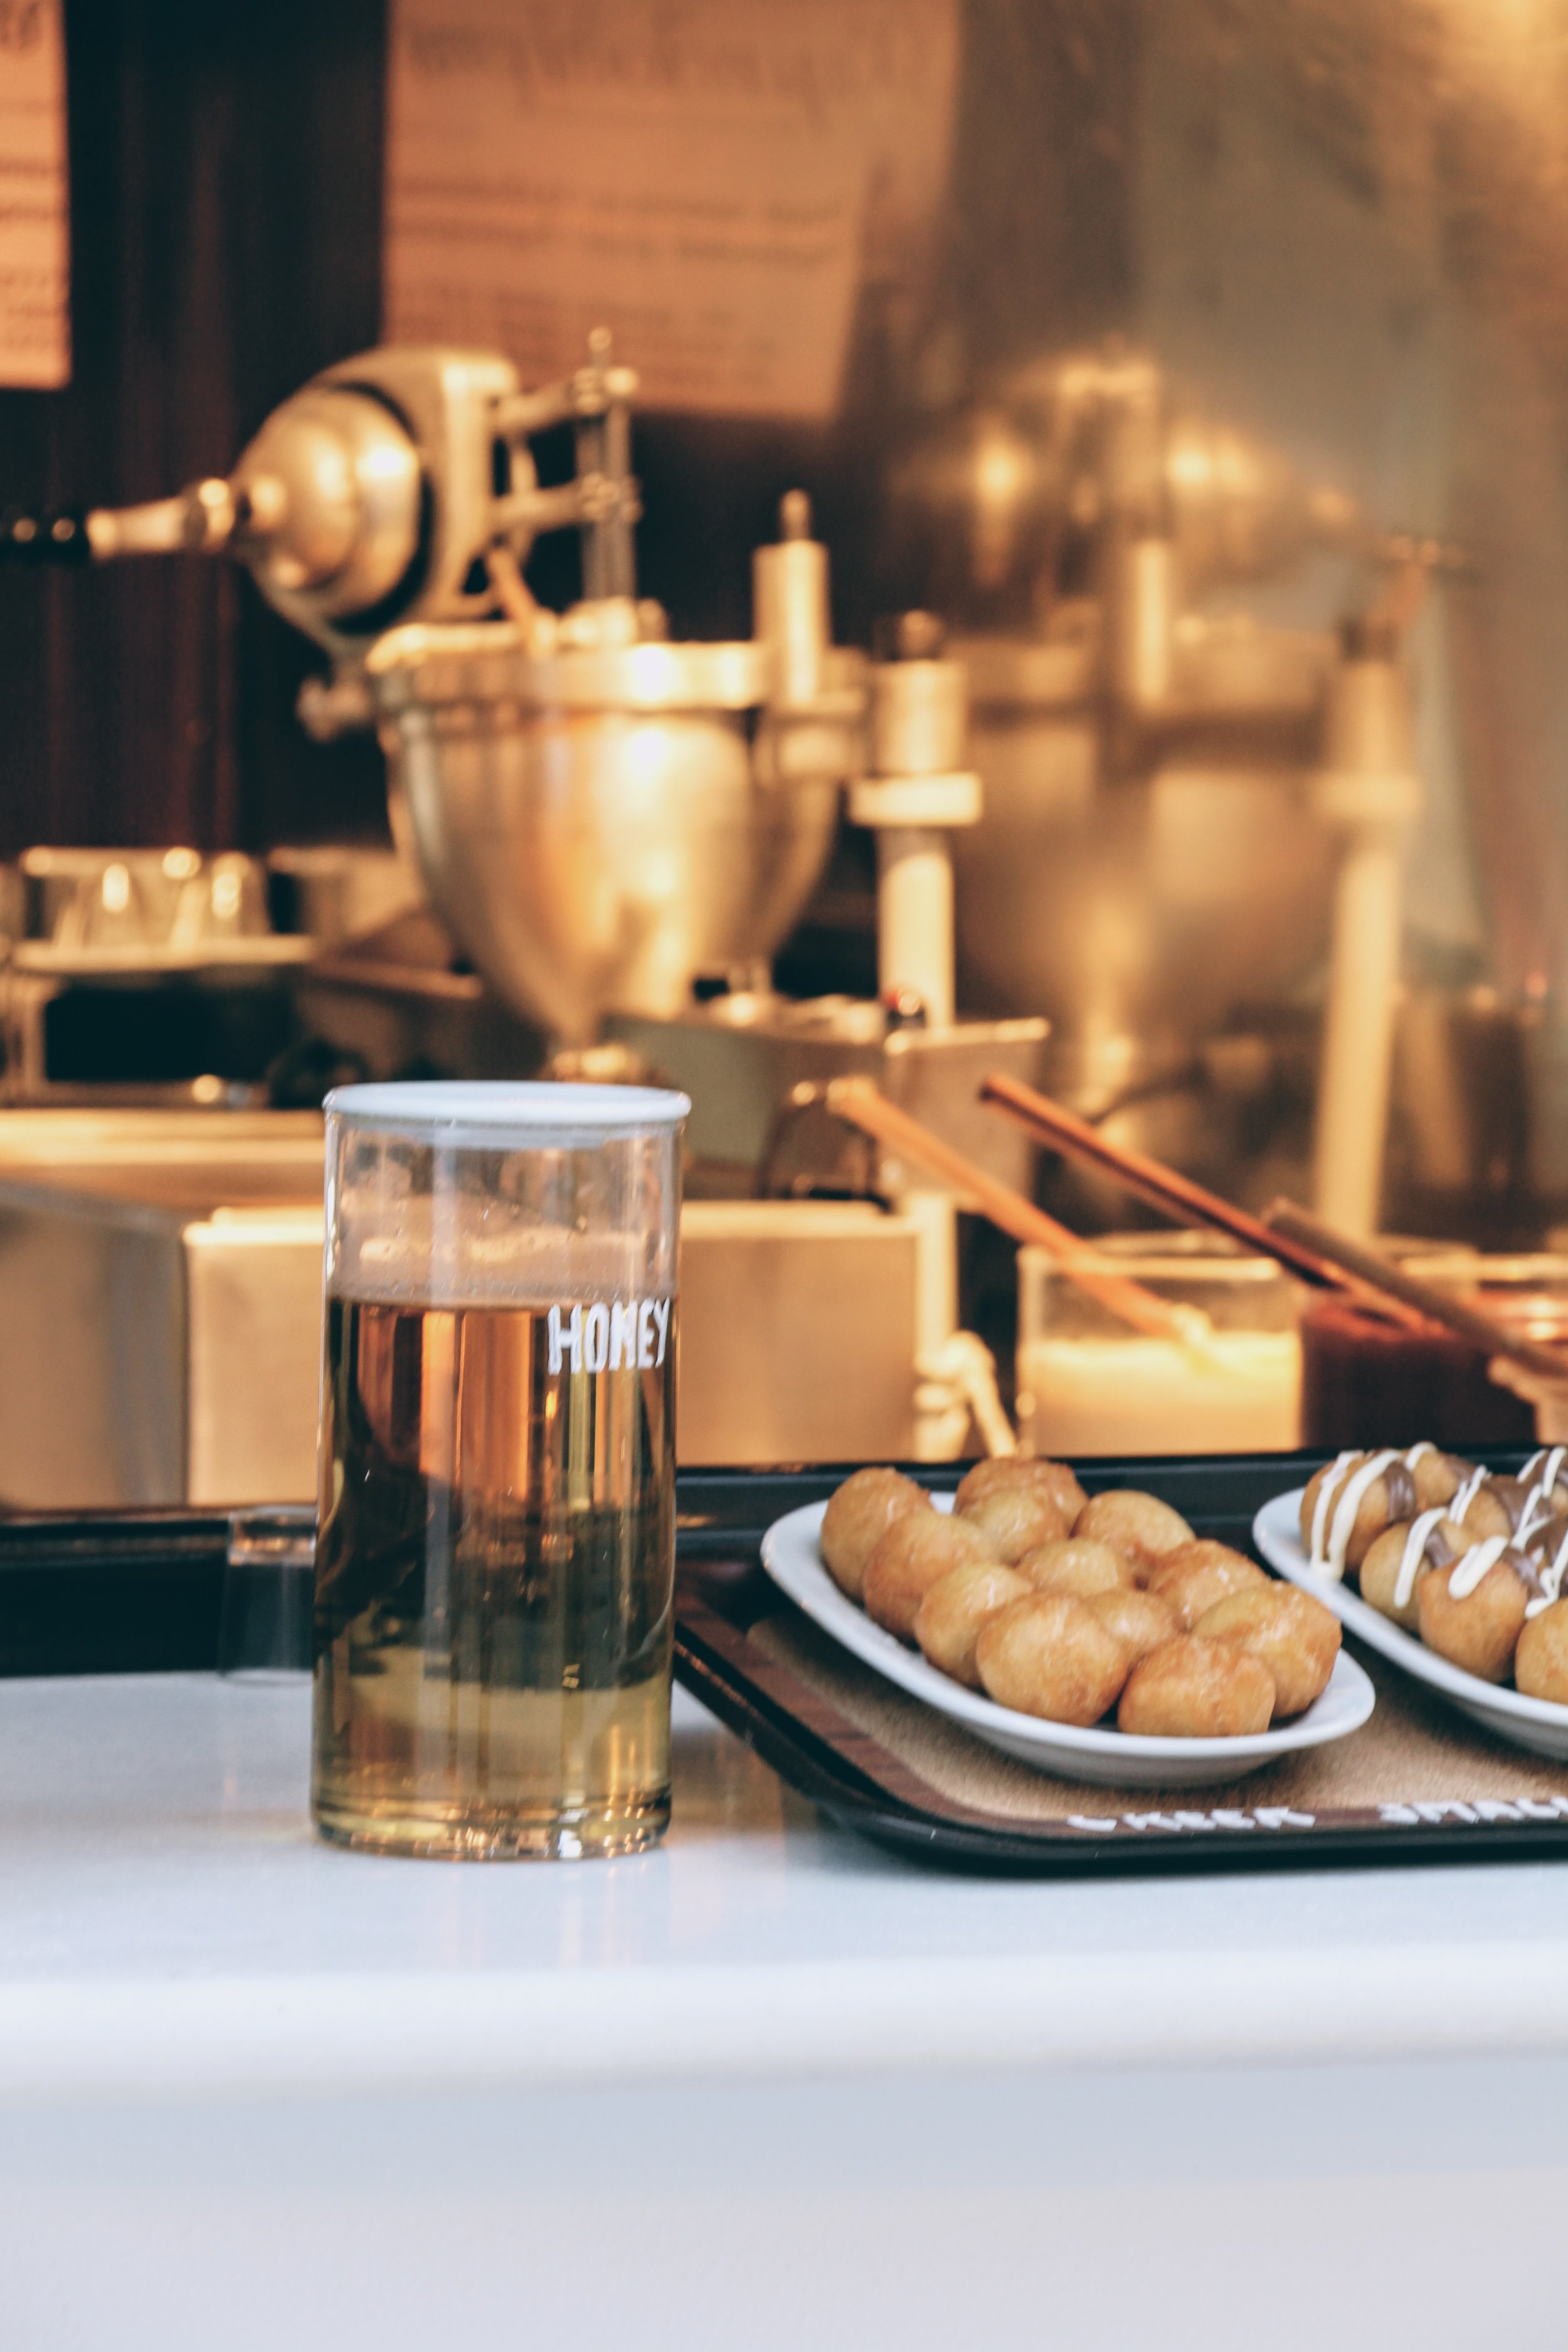 The infamous honey dumplings in Naoussa